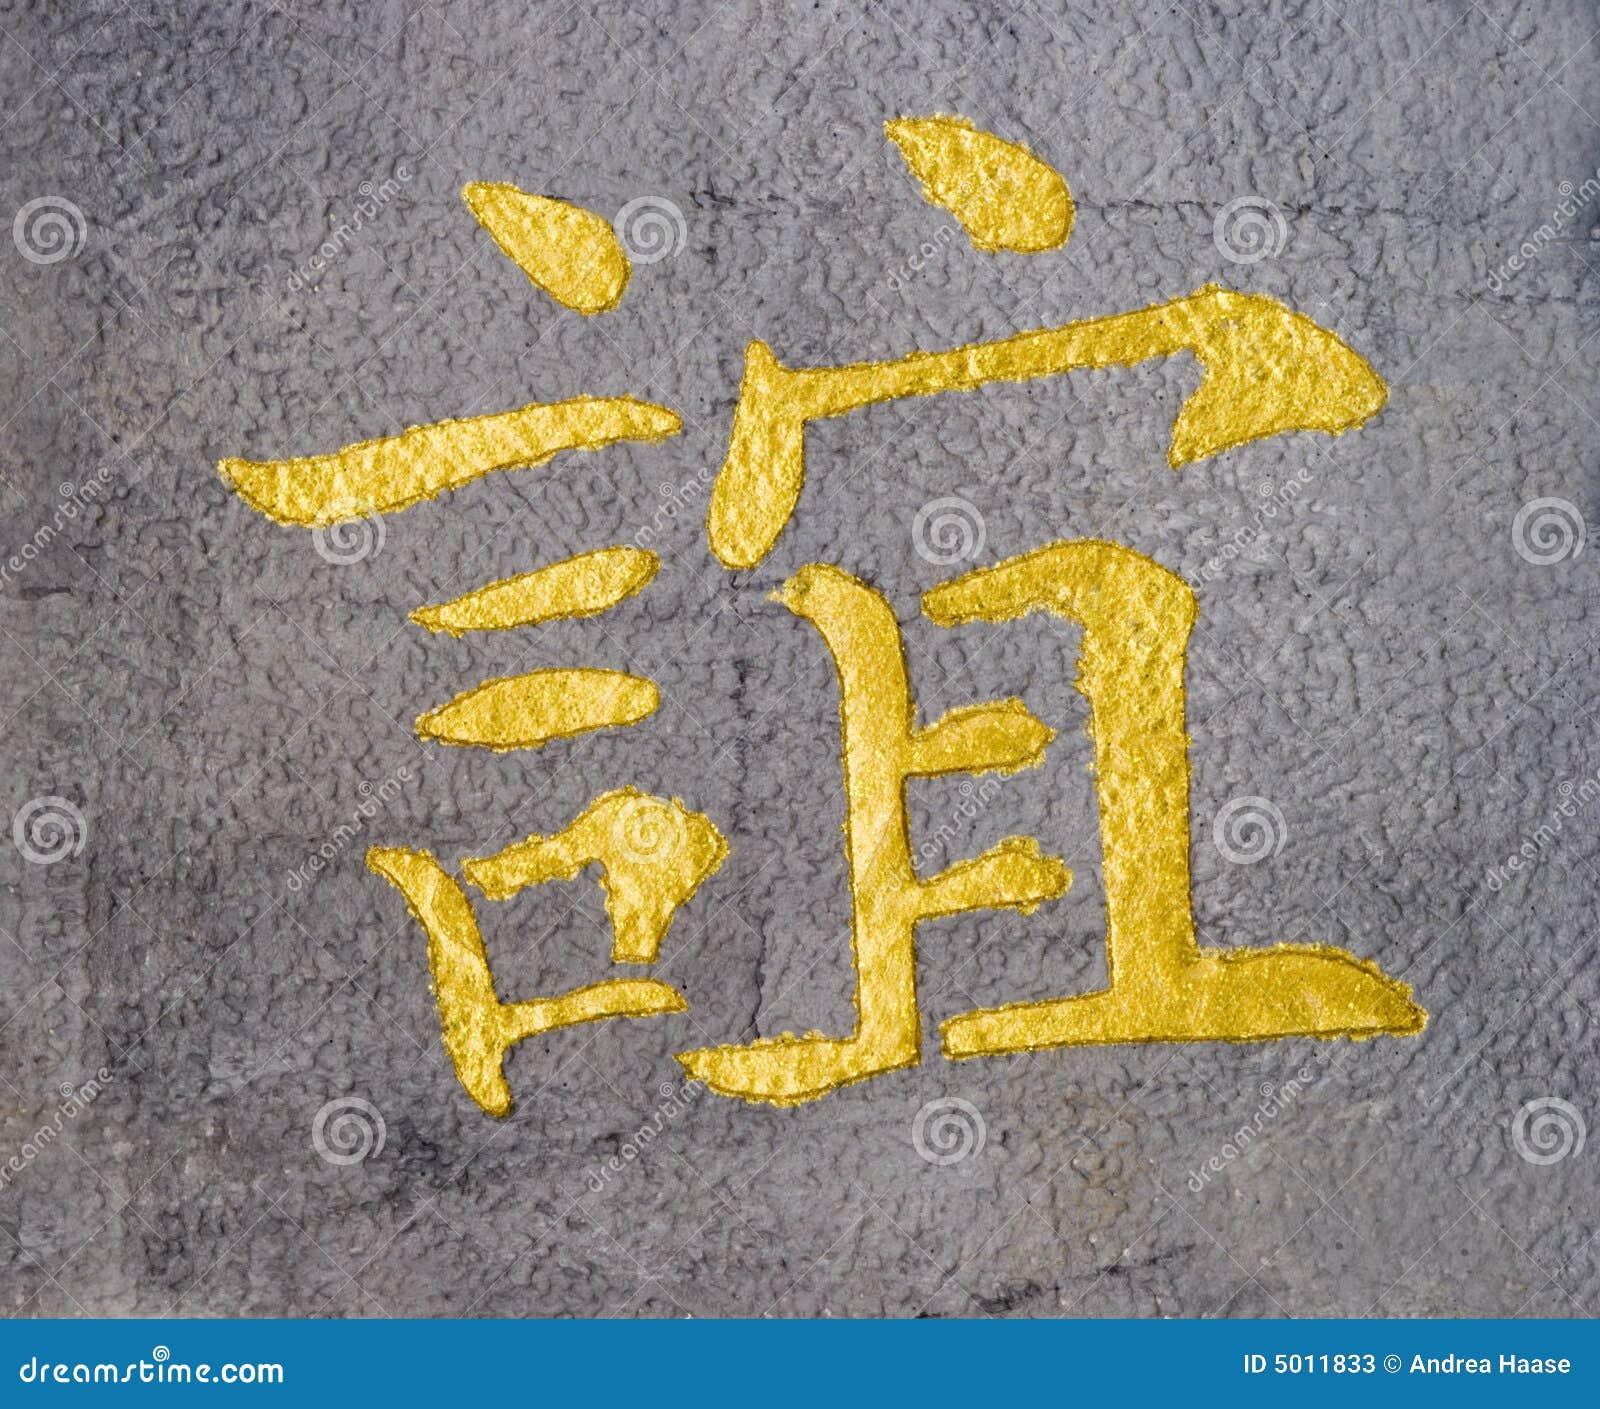 symbole chinois d 39 amiti photos stock image 5011833. Black Bedroom Furniture Sets. Home Design Ideas